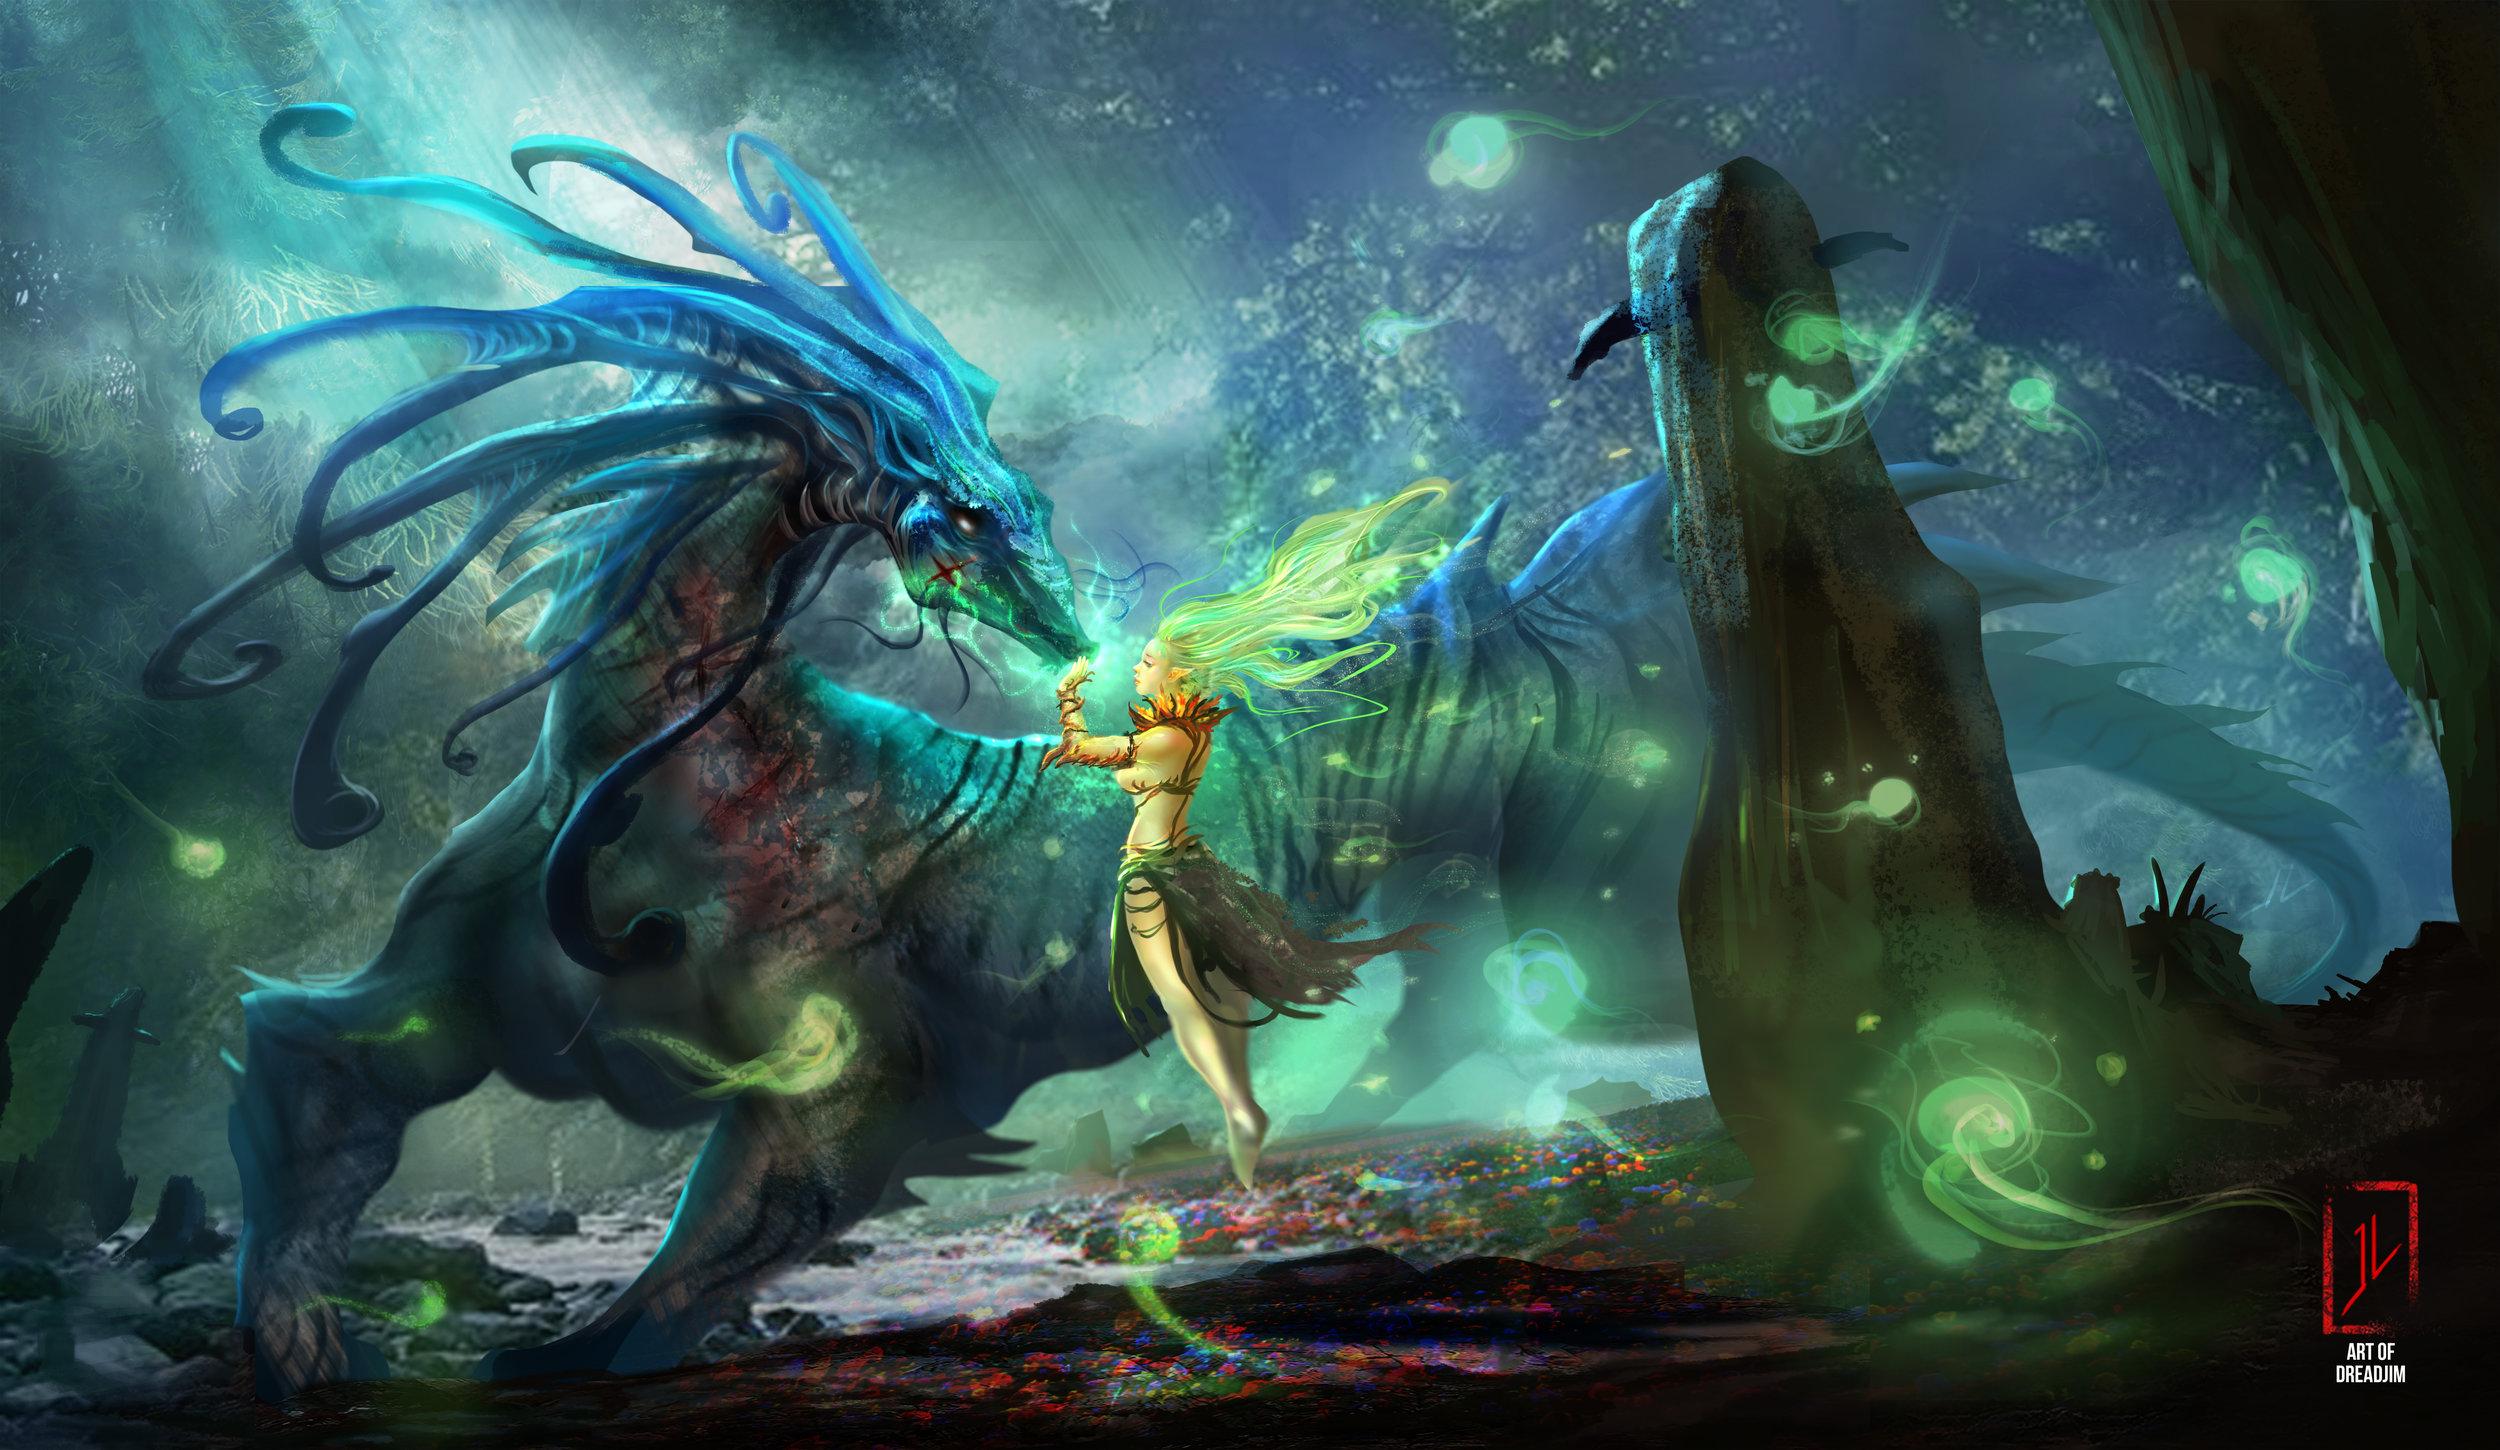 Gaia's Embrace by  Dreadjim.  https://www.dreadjim.com/